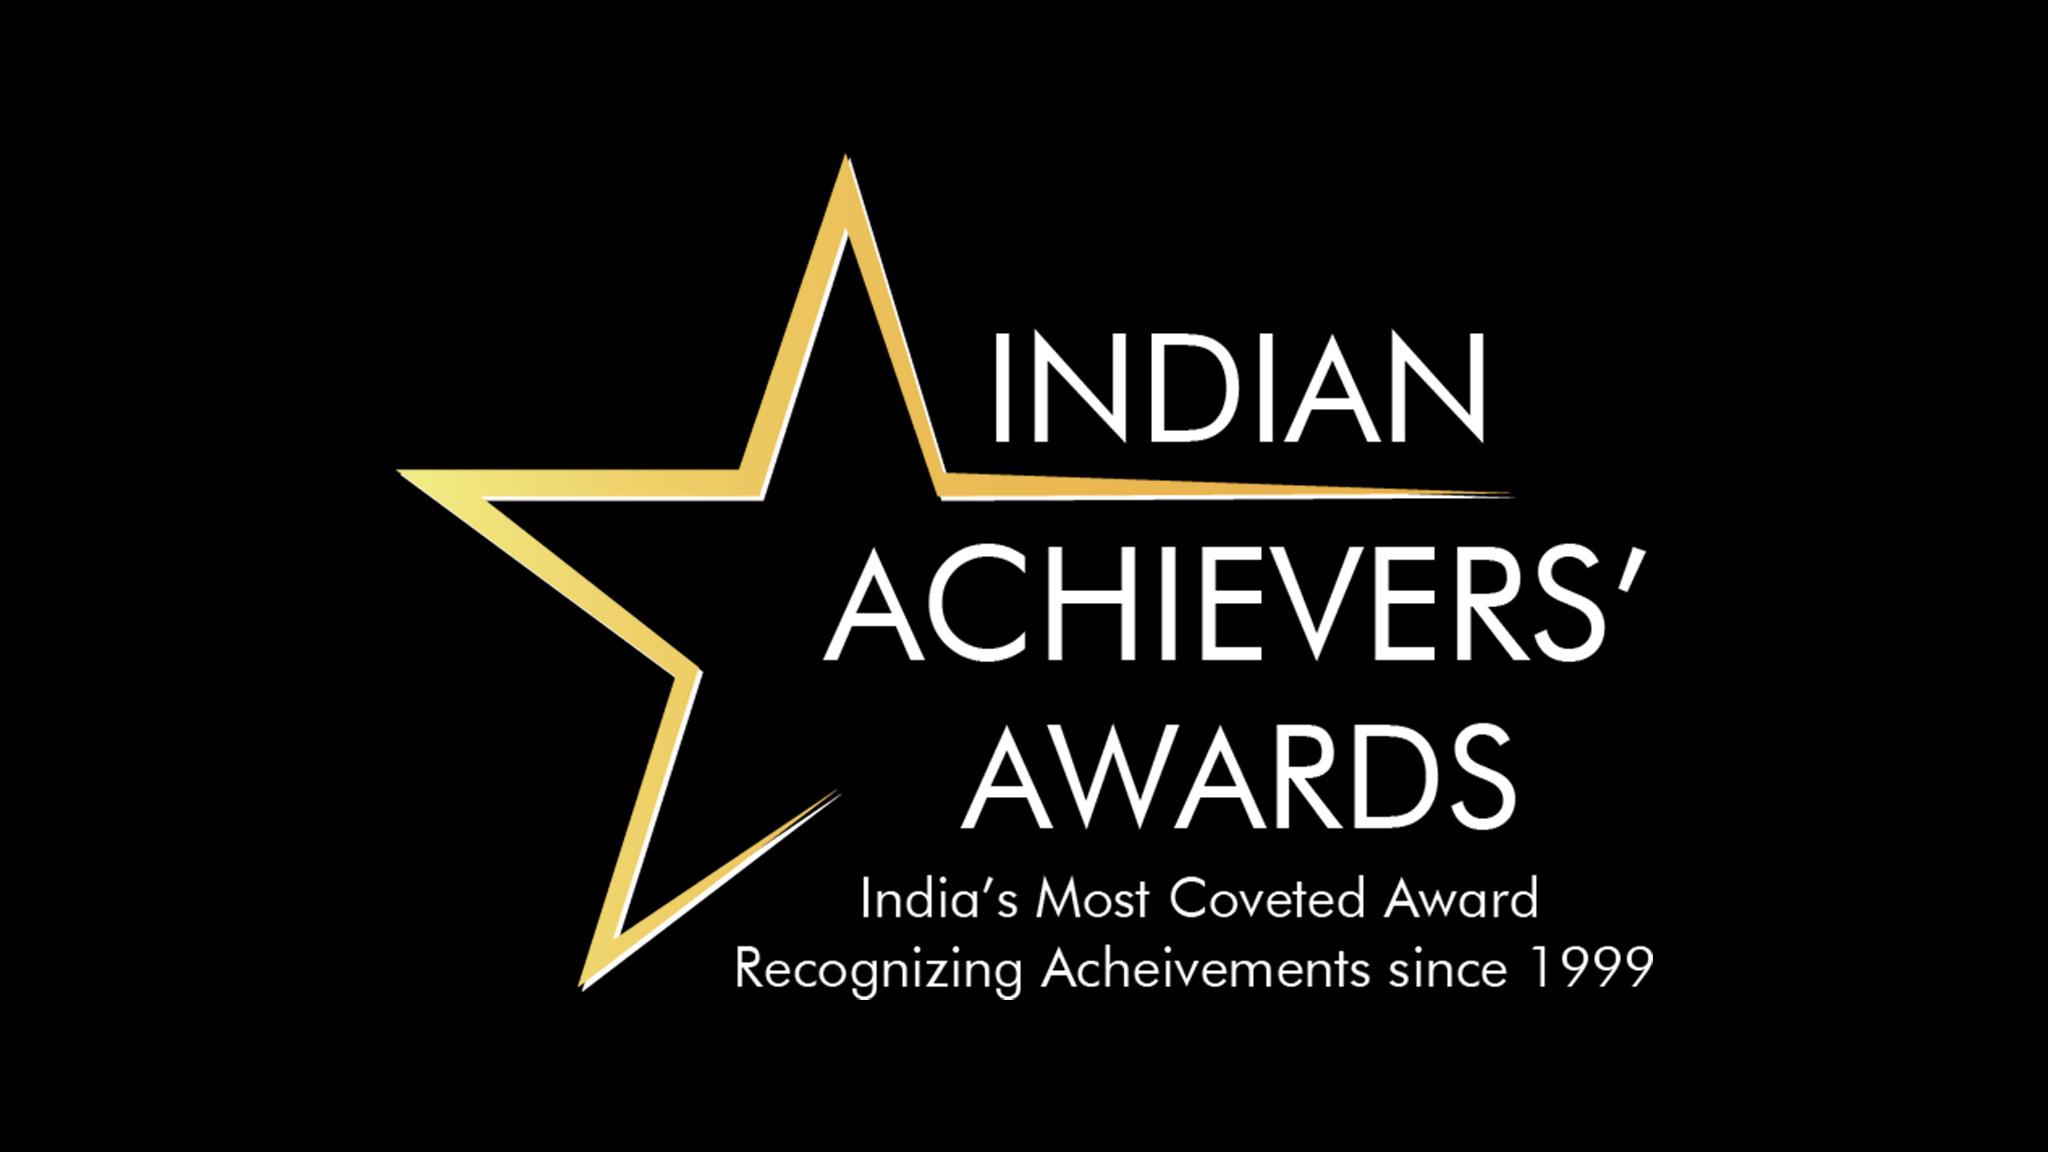 Nidhi Sharma - Indian Achievers Award